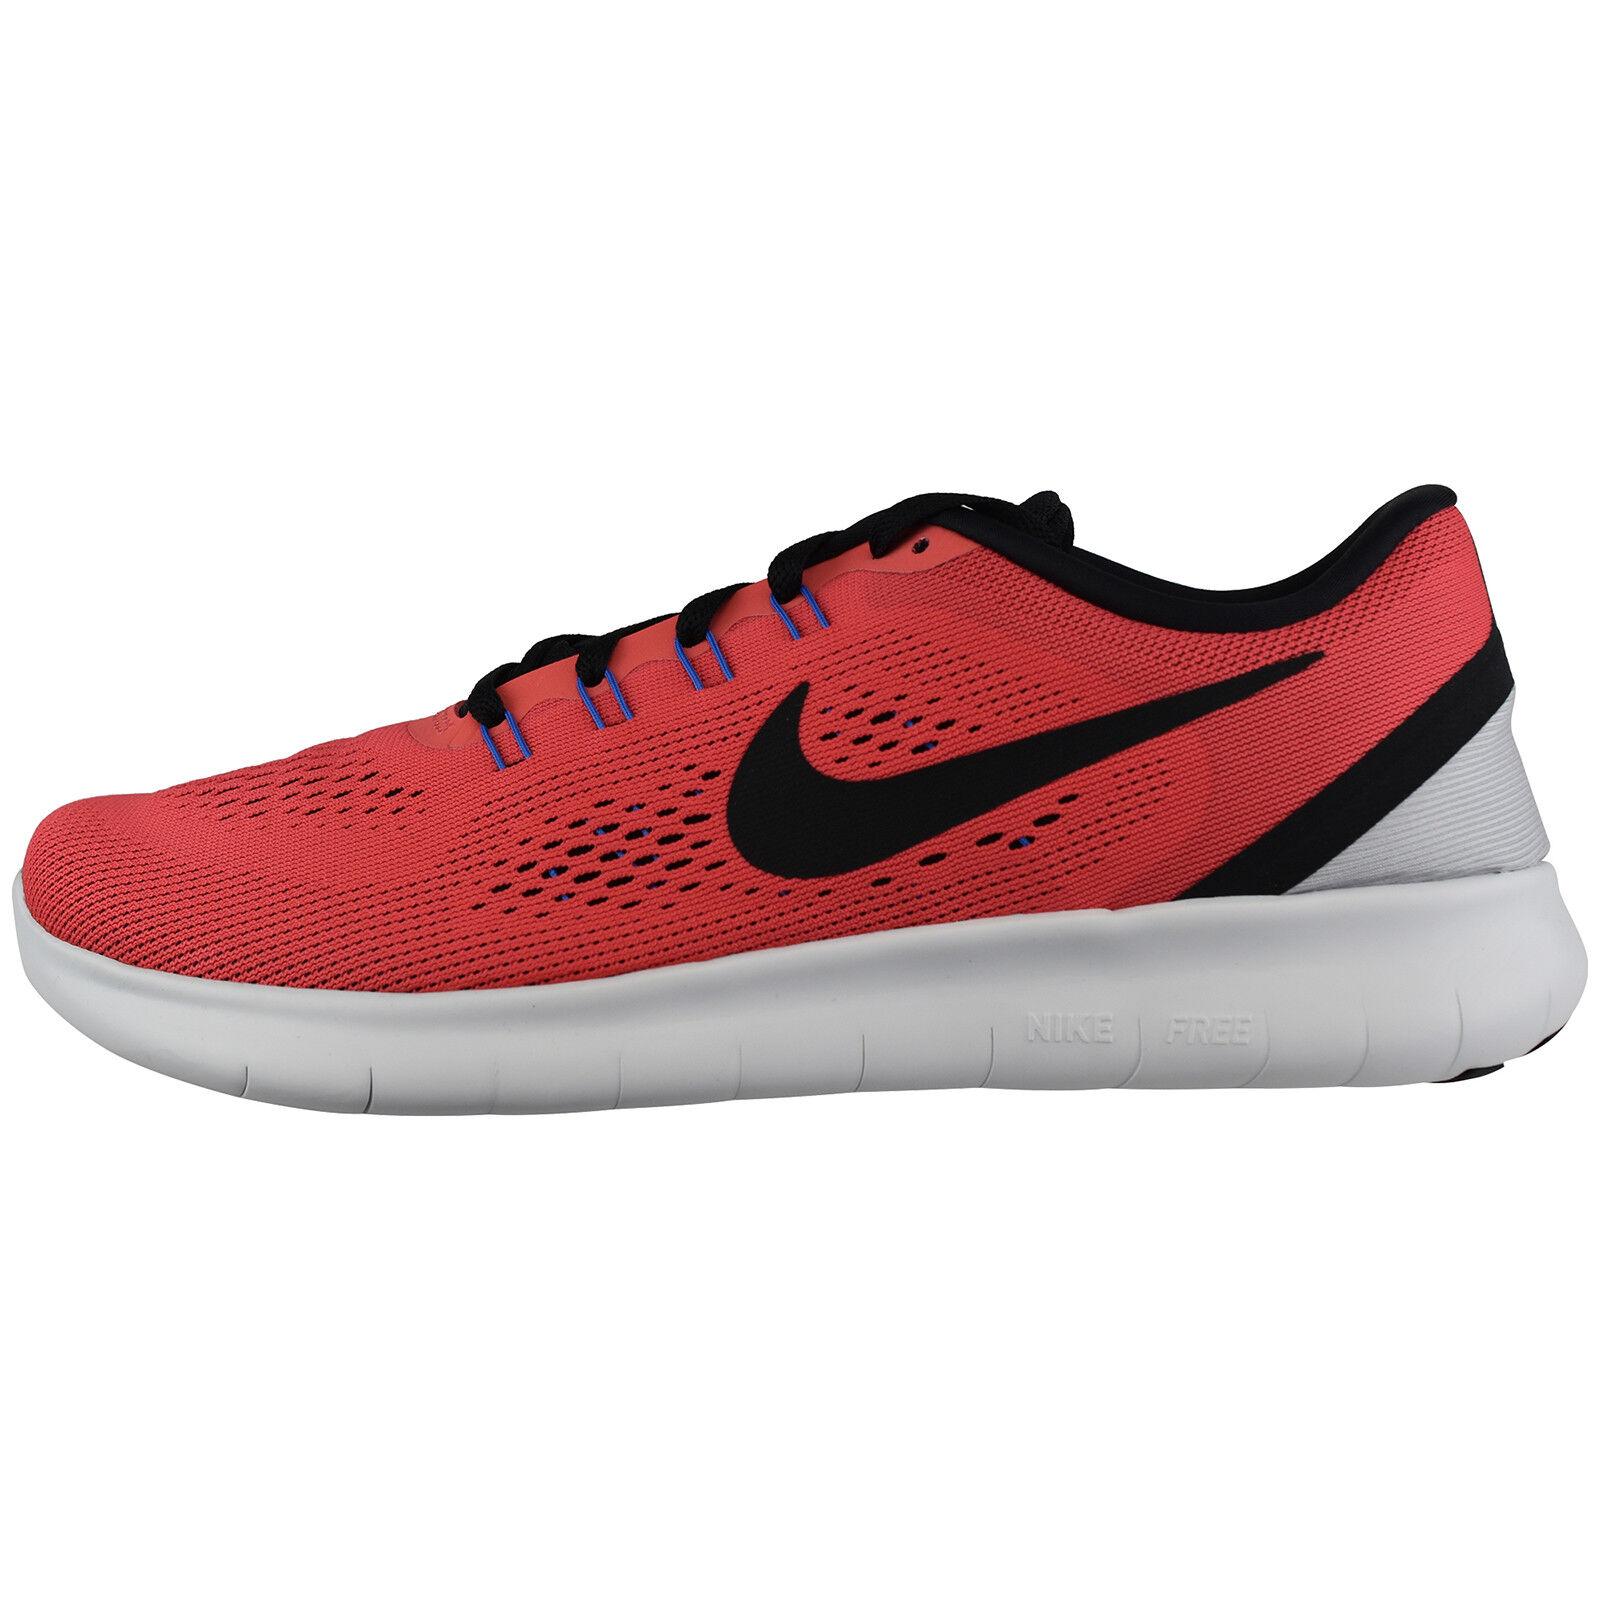 best service e0b31 c2ebb Nike Free Rn 831508-802 Lifestyle Running shoes Running Running Running  Running Casual Trainers 6fca0f